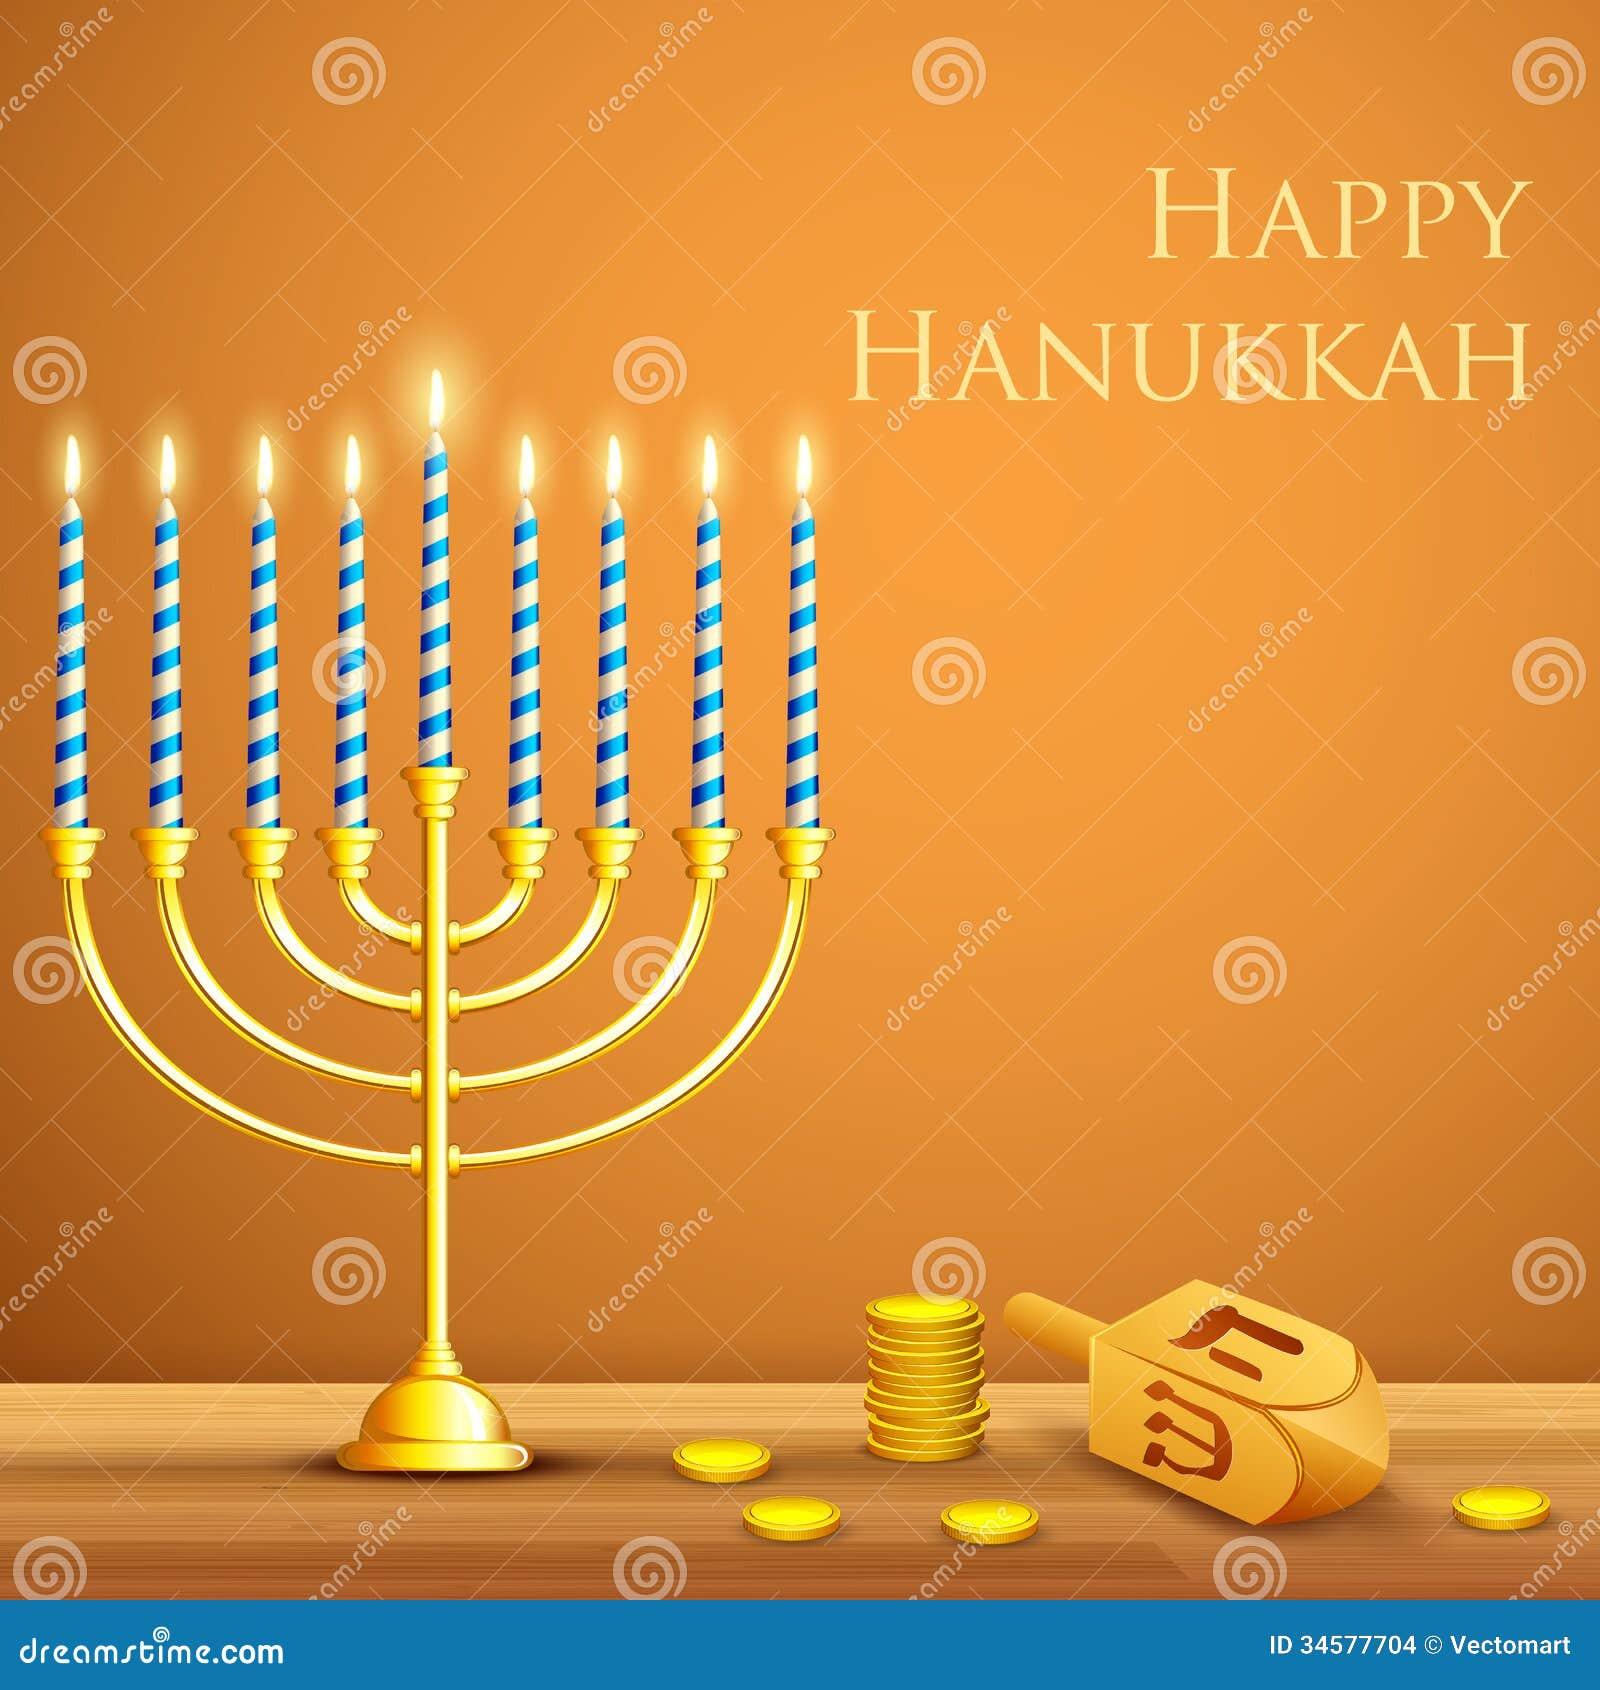 Illustration of burning candle in Hanukkah Menorah with Dreidel.